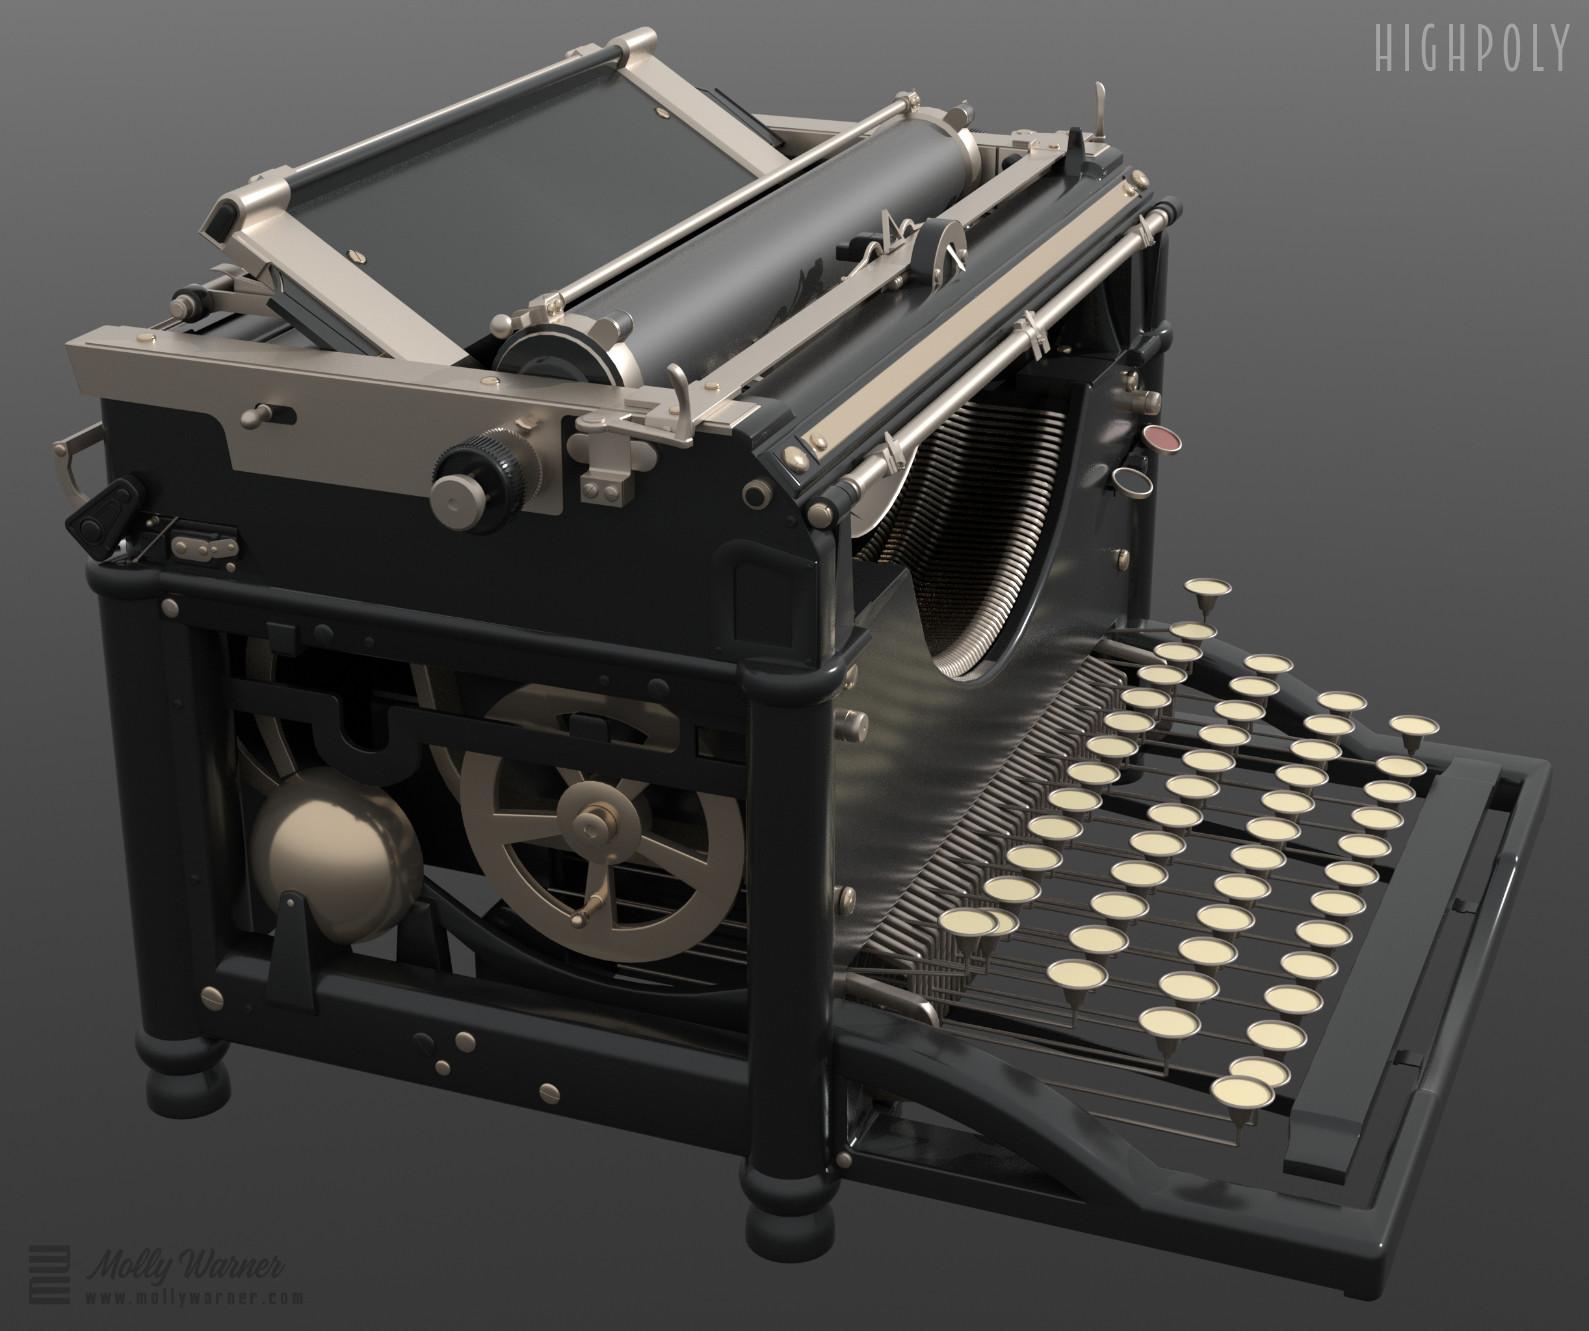 Molly warner mwarner typewriter final2